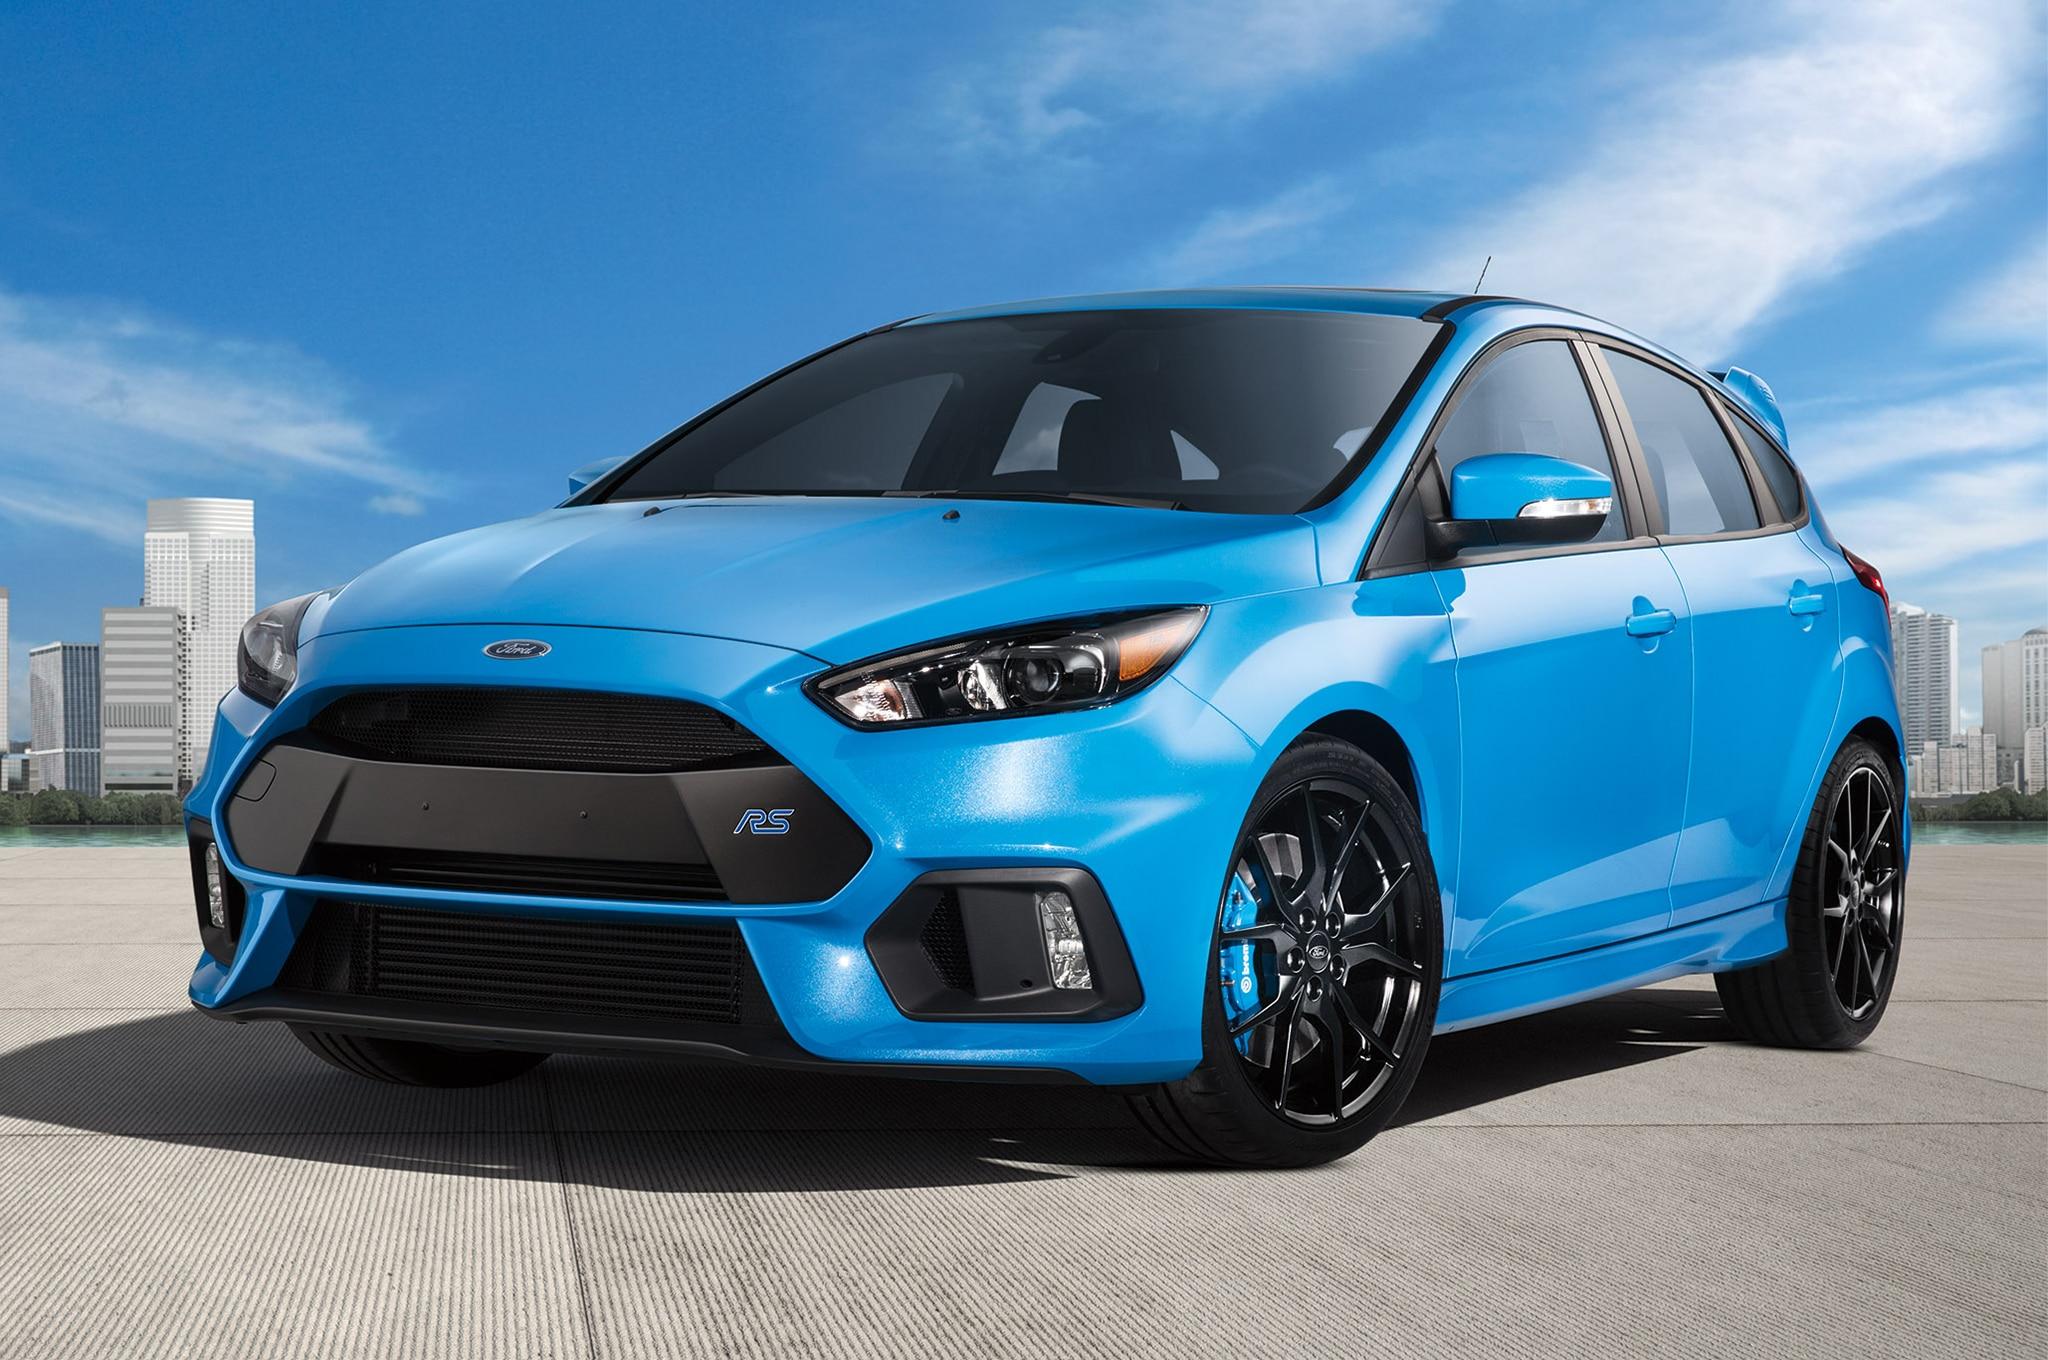 2017 Ford Focus RS front three quarter ارزان ترین تخفیف های اجاره ماشین در ماه   اجاره ماشین